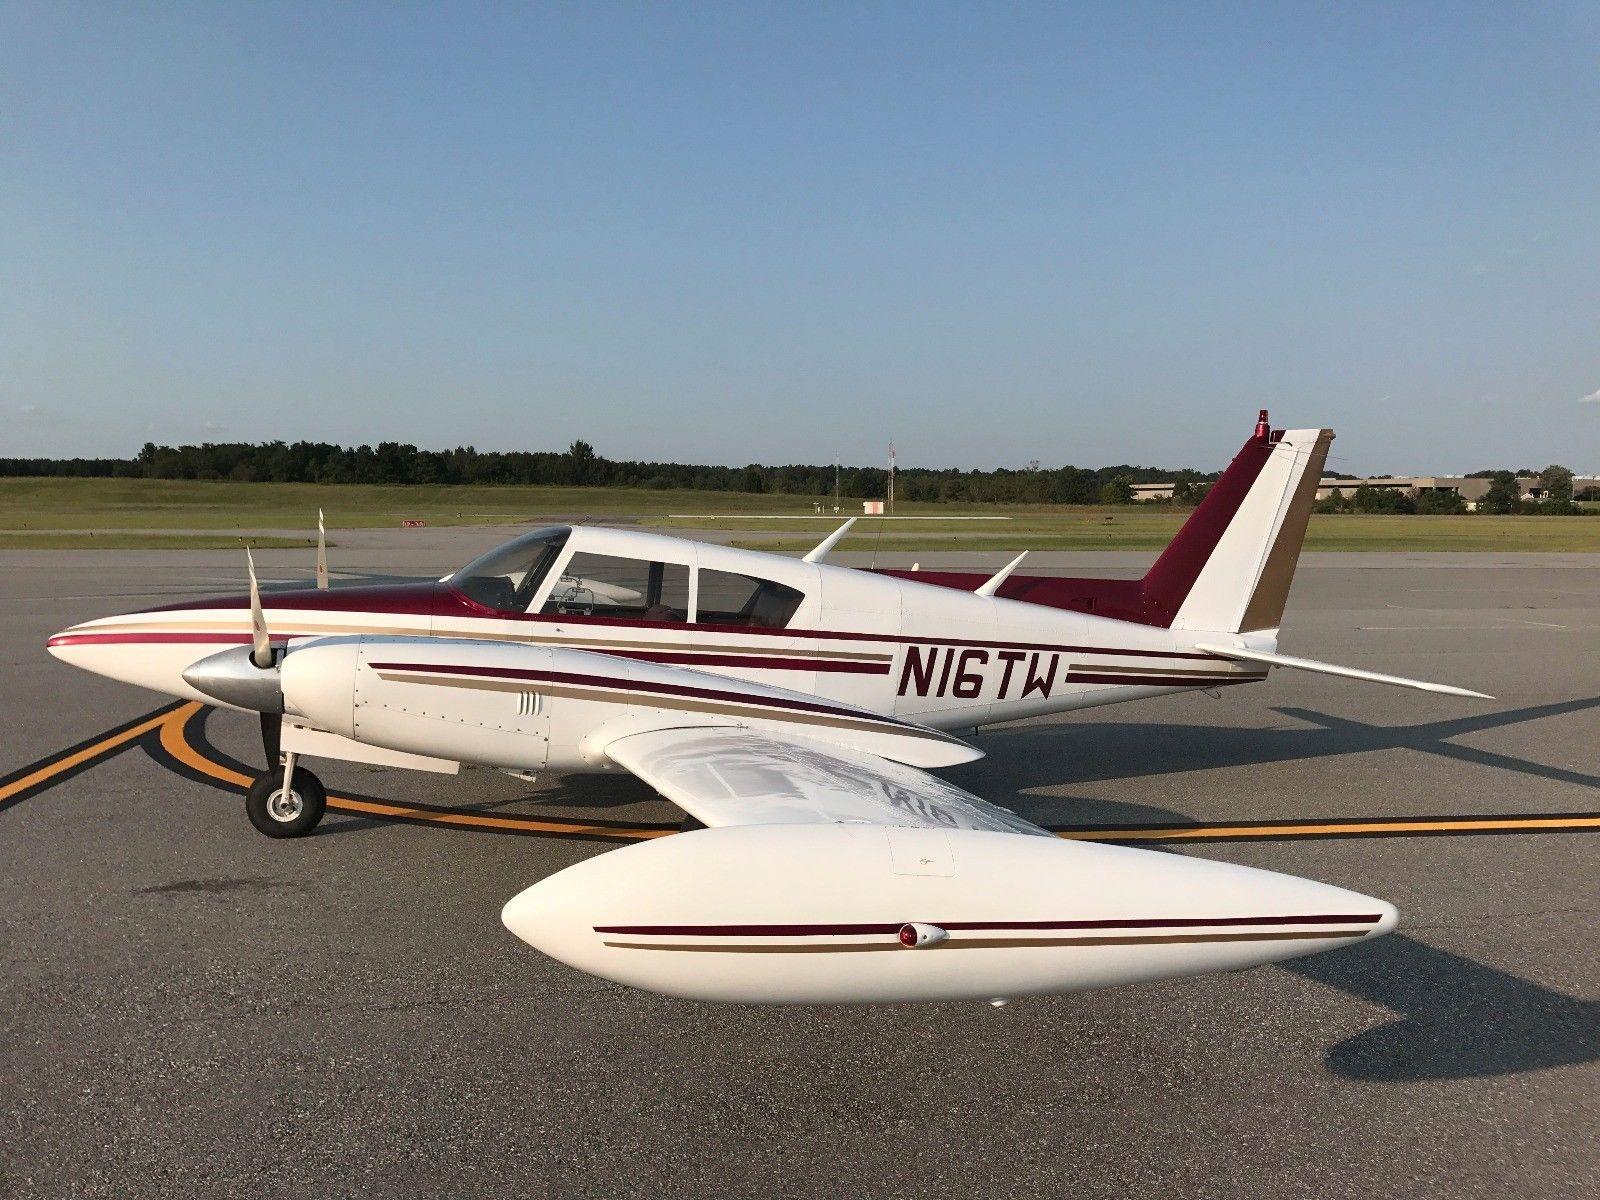 immaculate 1964 Piper PA30 Twin Comanche for sale